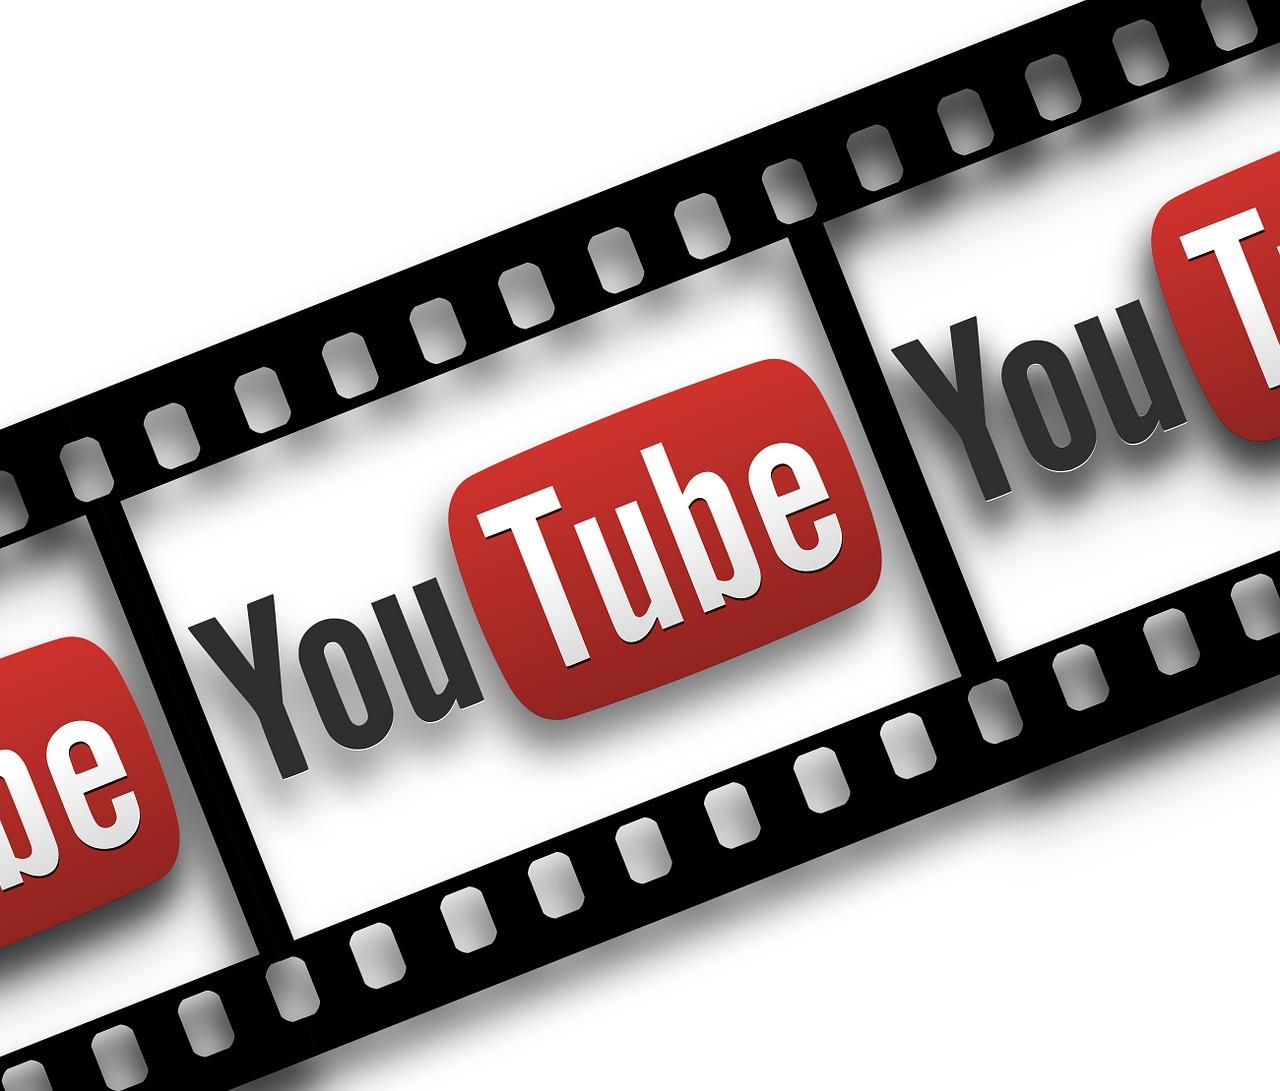 Héberger Sa Chaine Youtube sur son site avec Google Youtube API